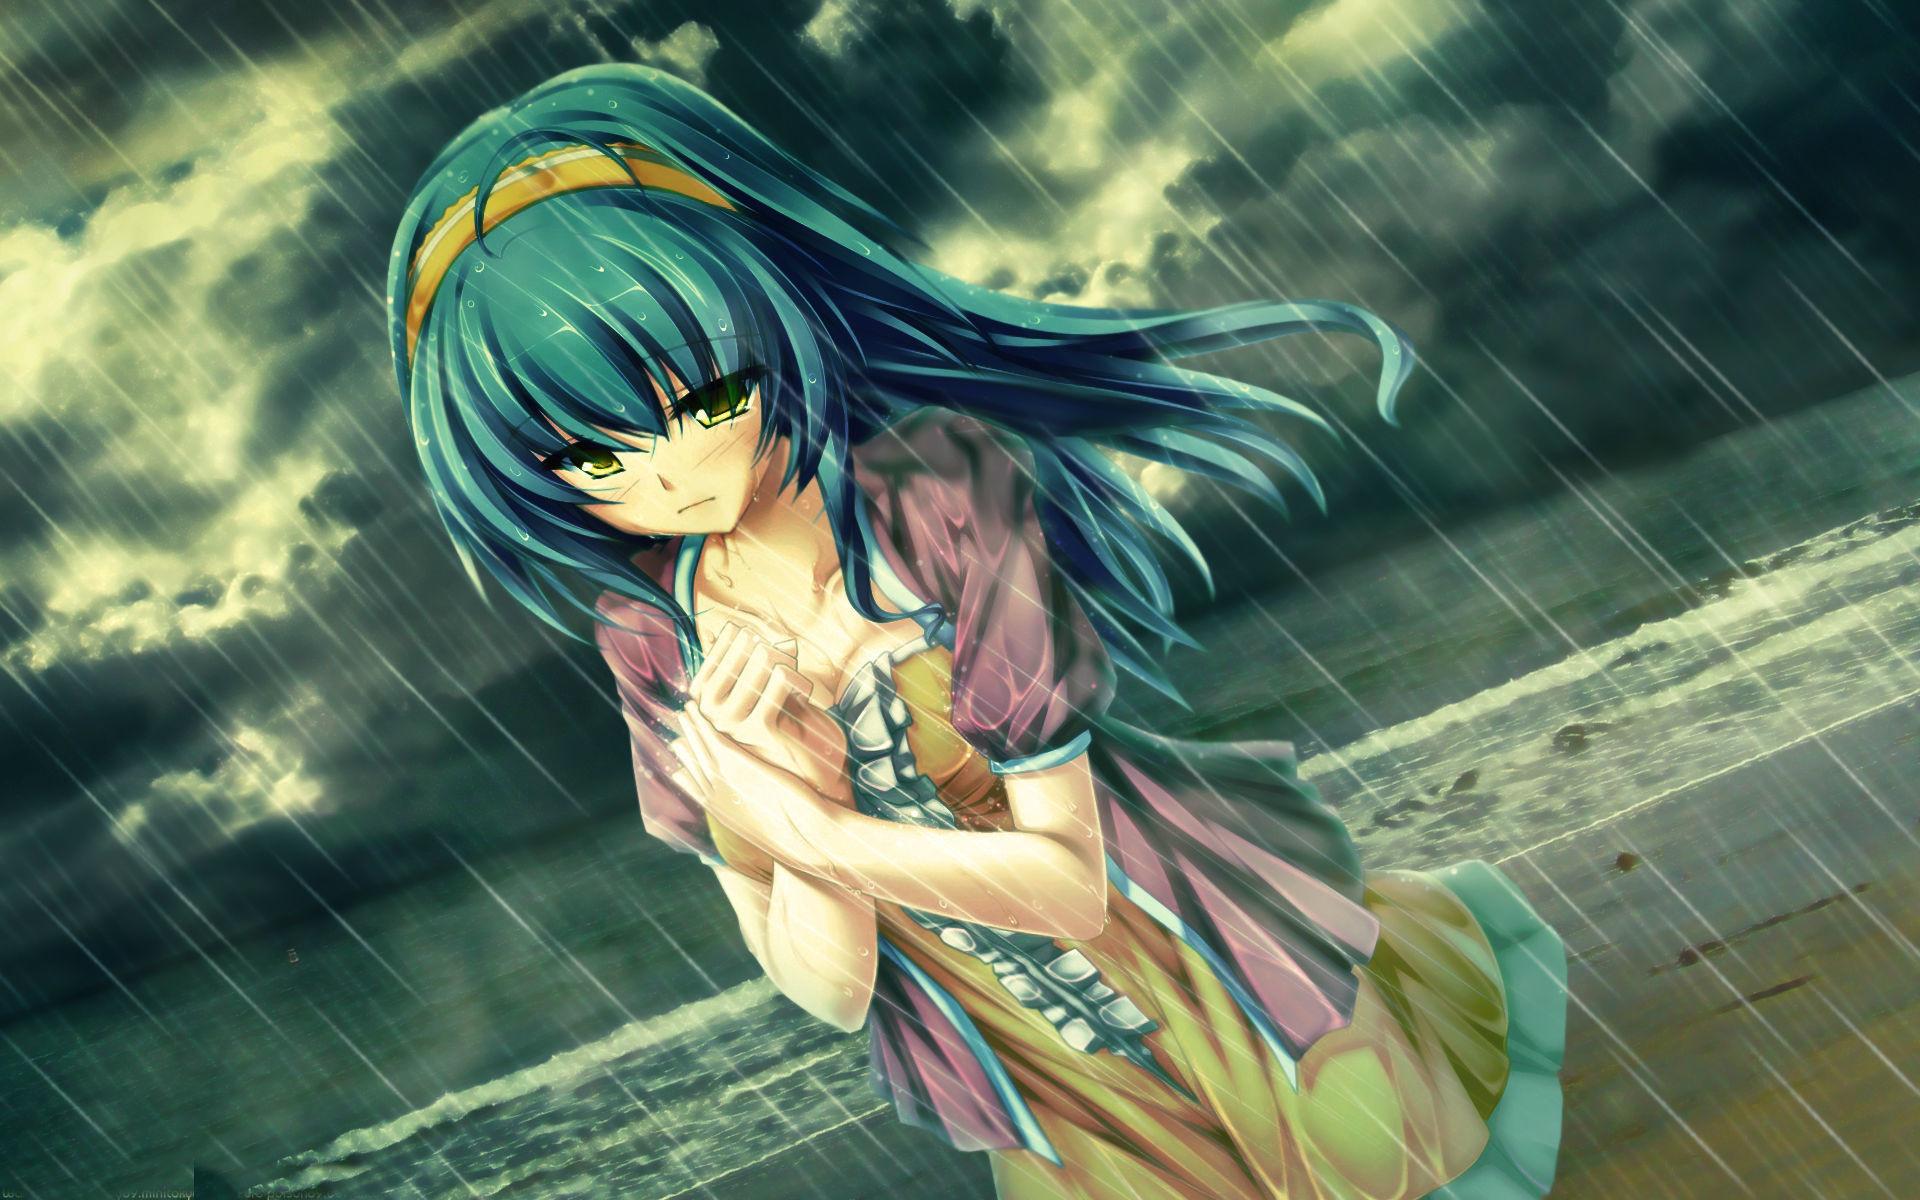 Sad Boy And Girl Wallpaper Full Hd Sad Anime Wallpaper 64 Images